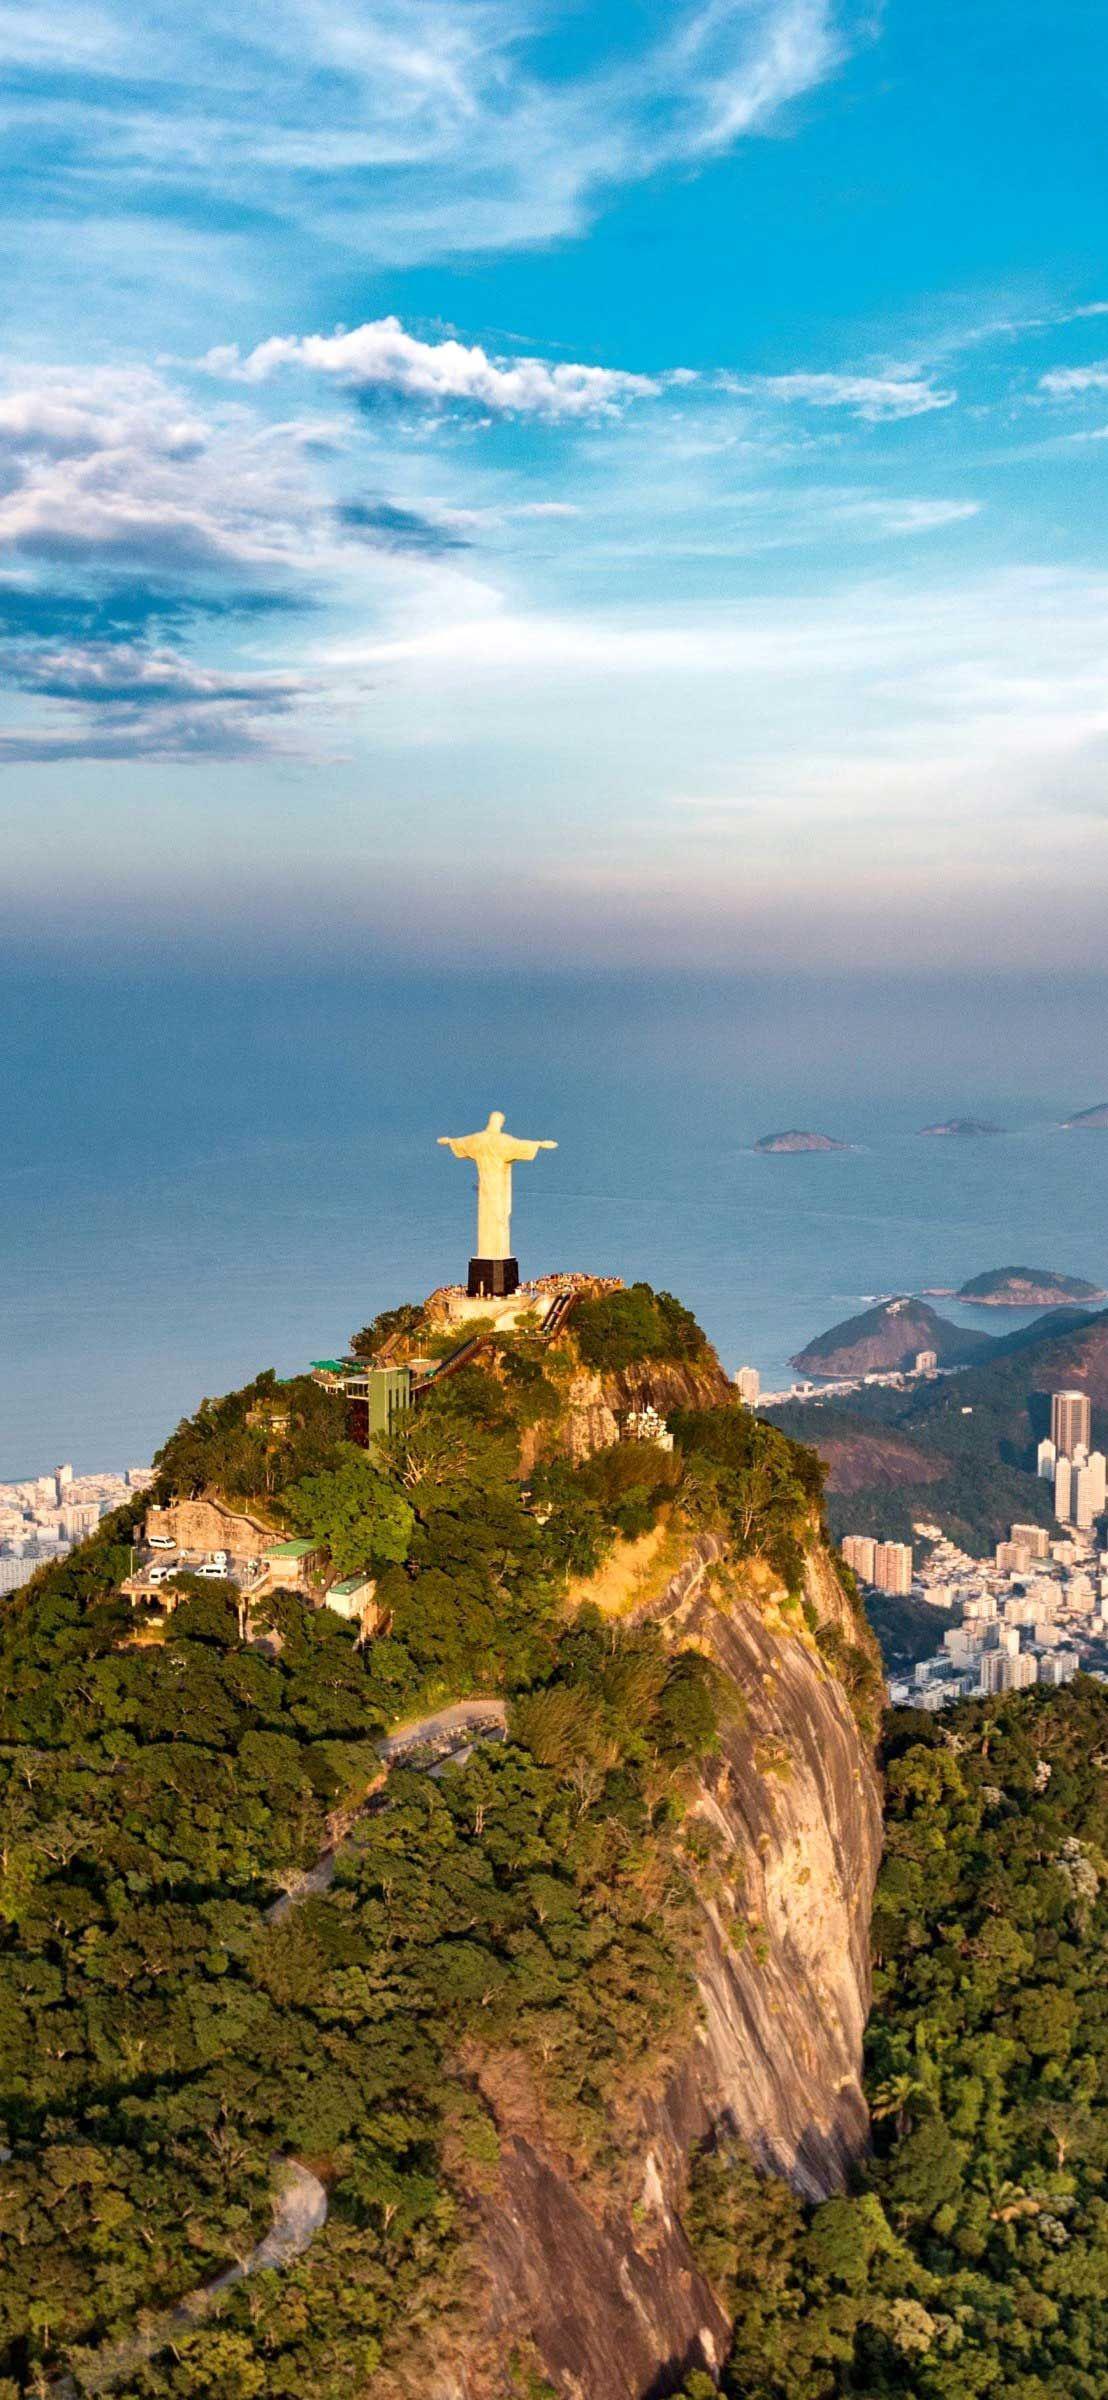 Iphone Wallpaper Cliffs Of Rio De Janeiro City Hd Wallpaper Hd Wallpaper Best Nature Wallpapers